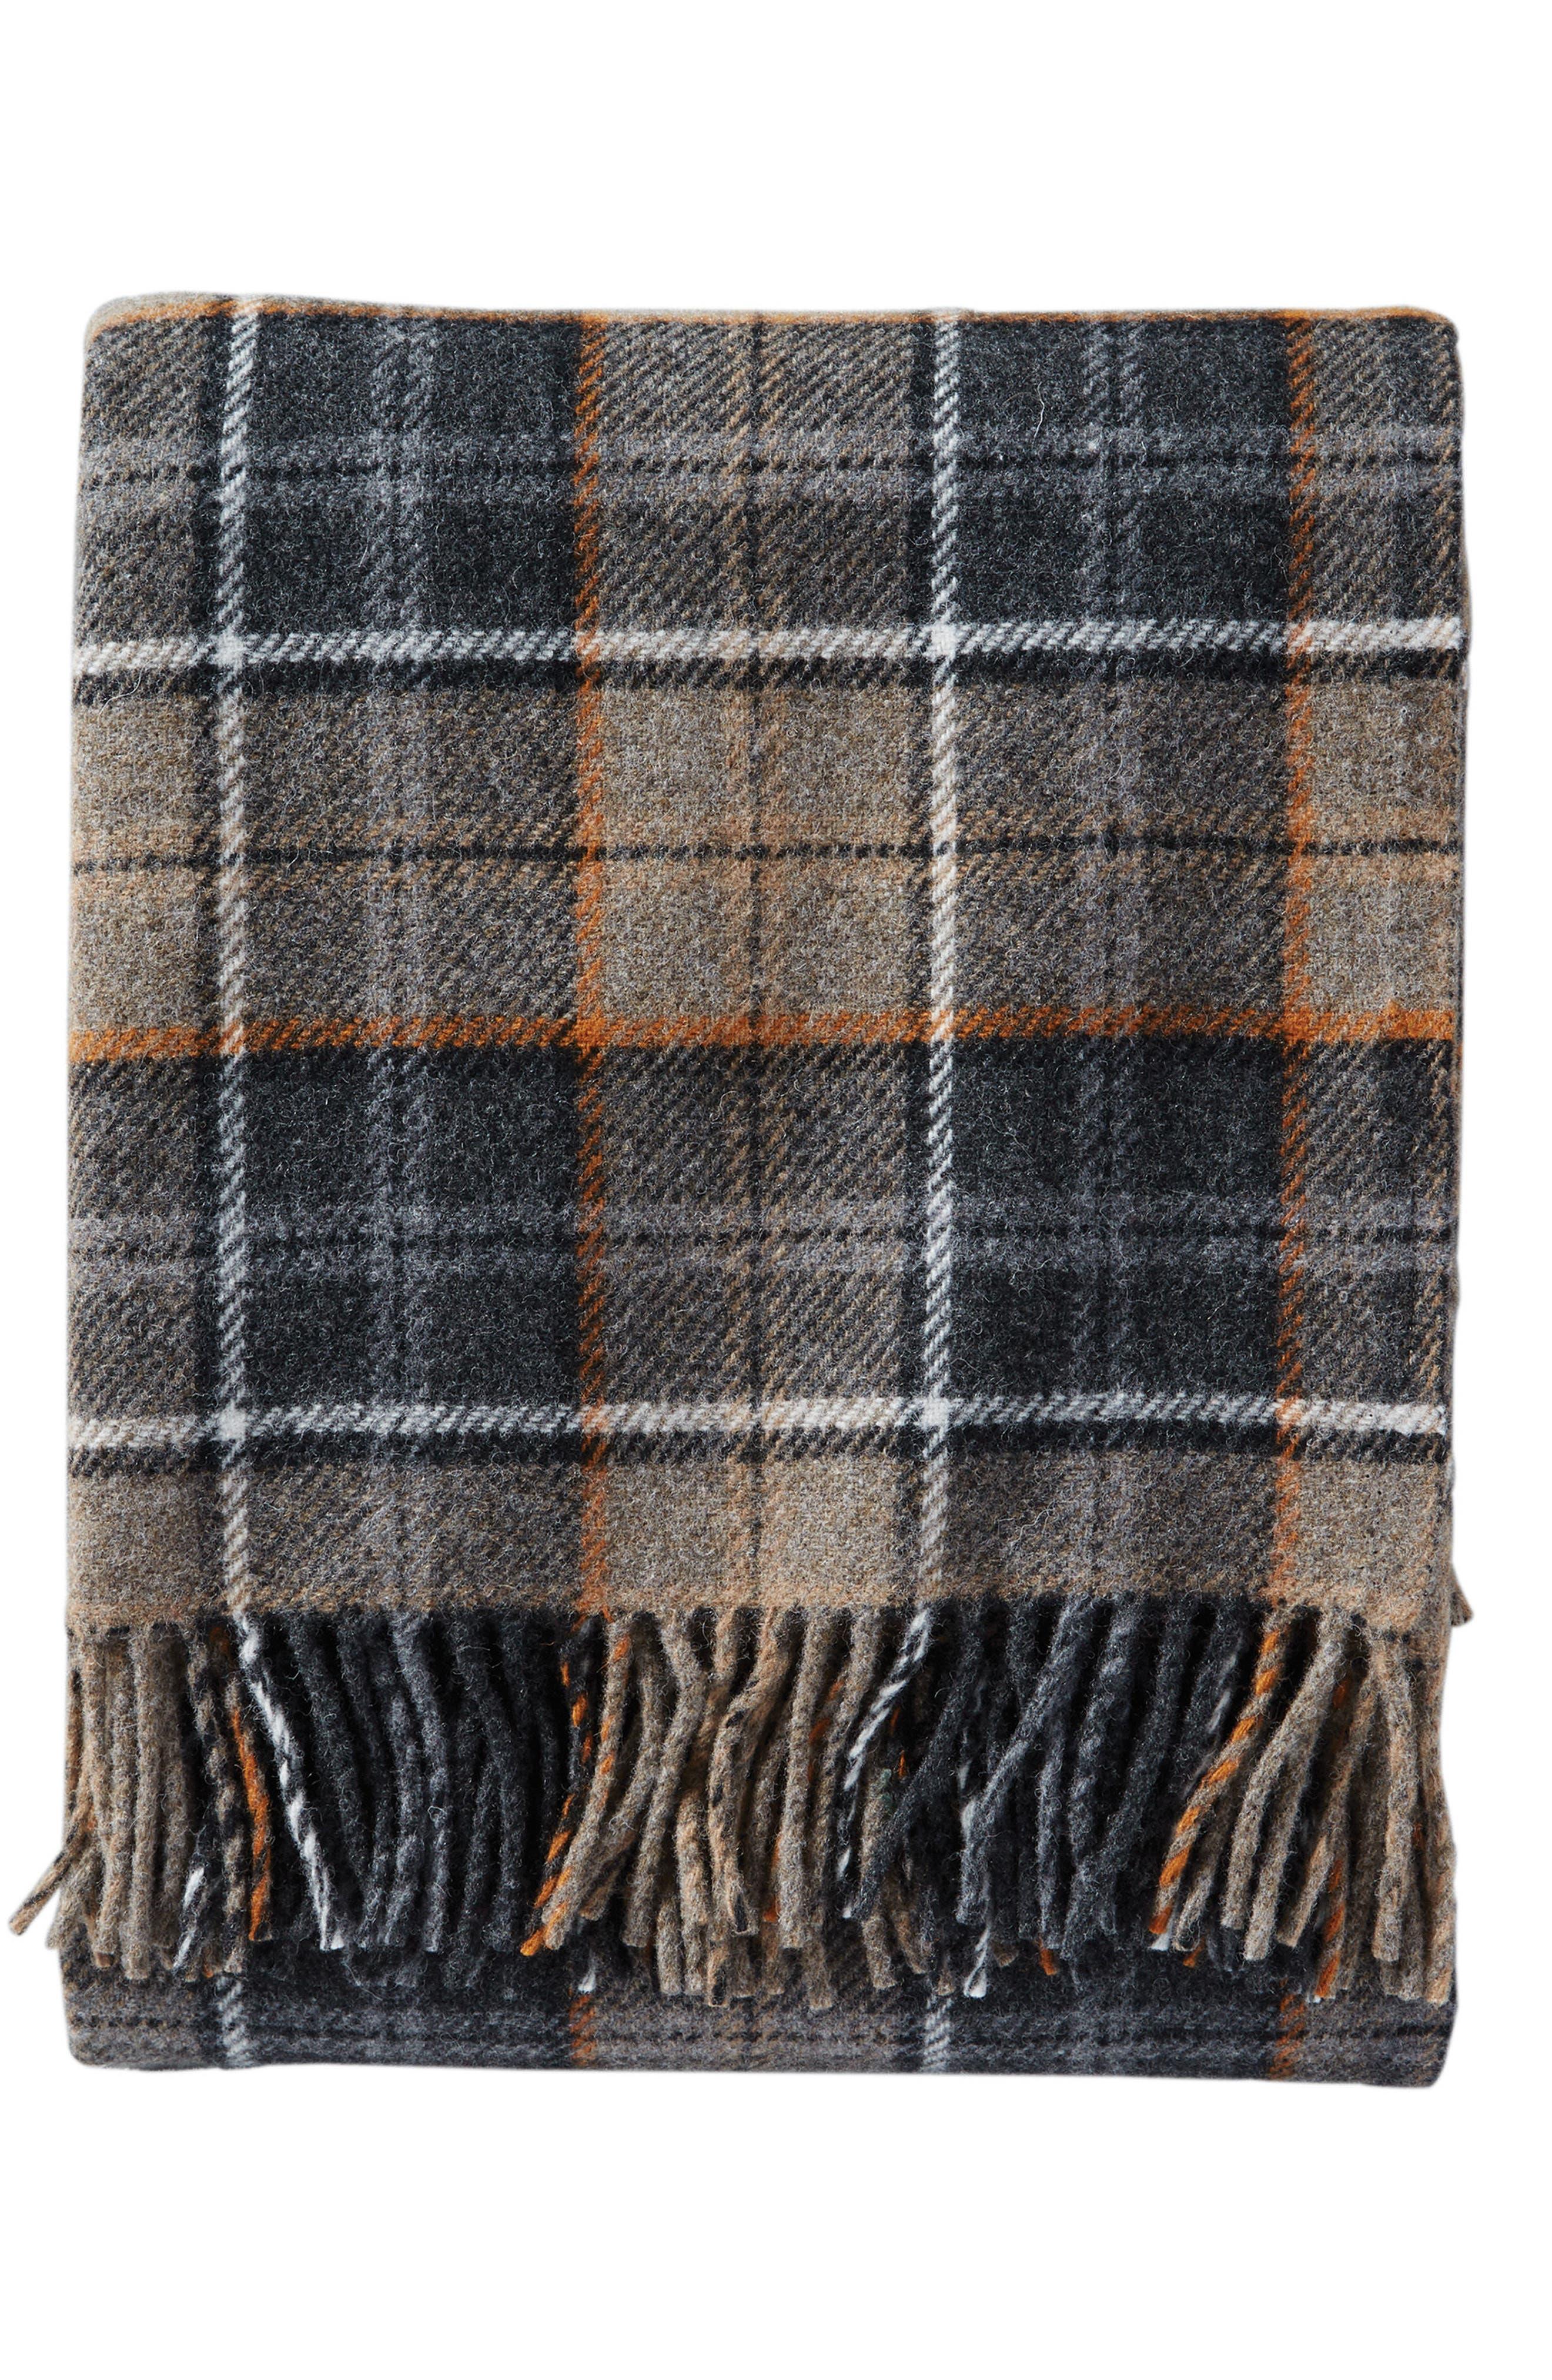 Plaid Wool Throw,                             Main thumbnail 1, color,                             020